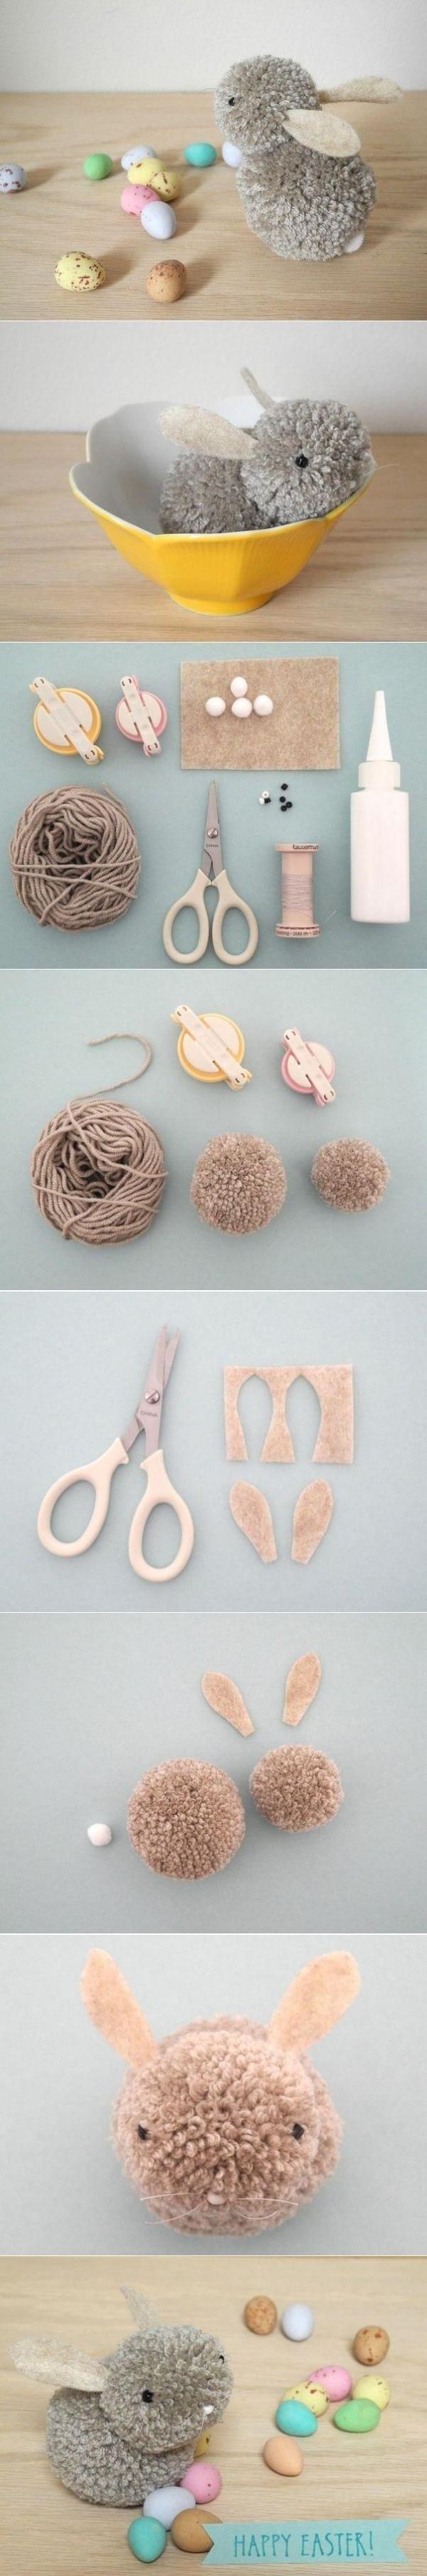 17. DIY Pom Pom #Bunny - 31 Playful Pom Pom #Crafts for Kids and Adults ... → DIY #Fever